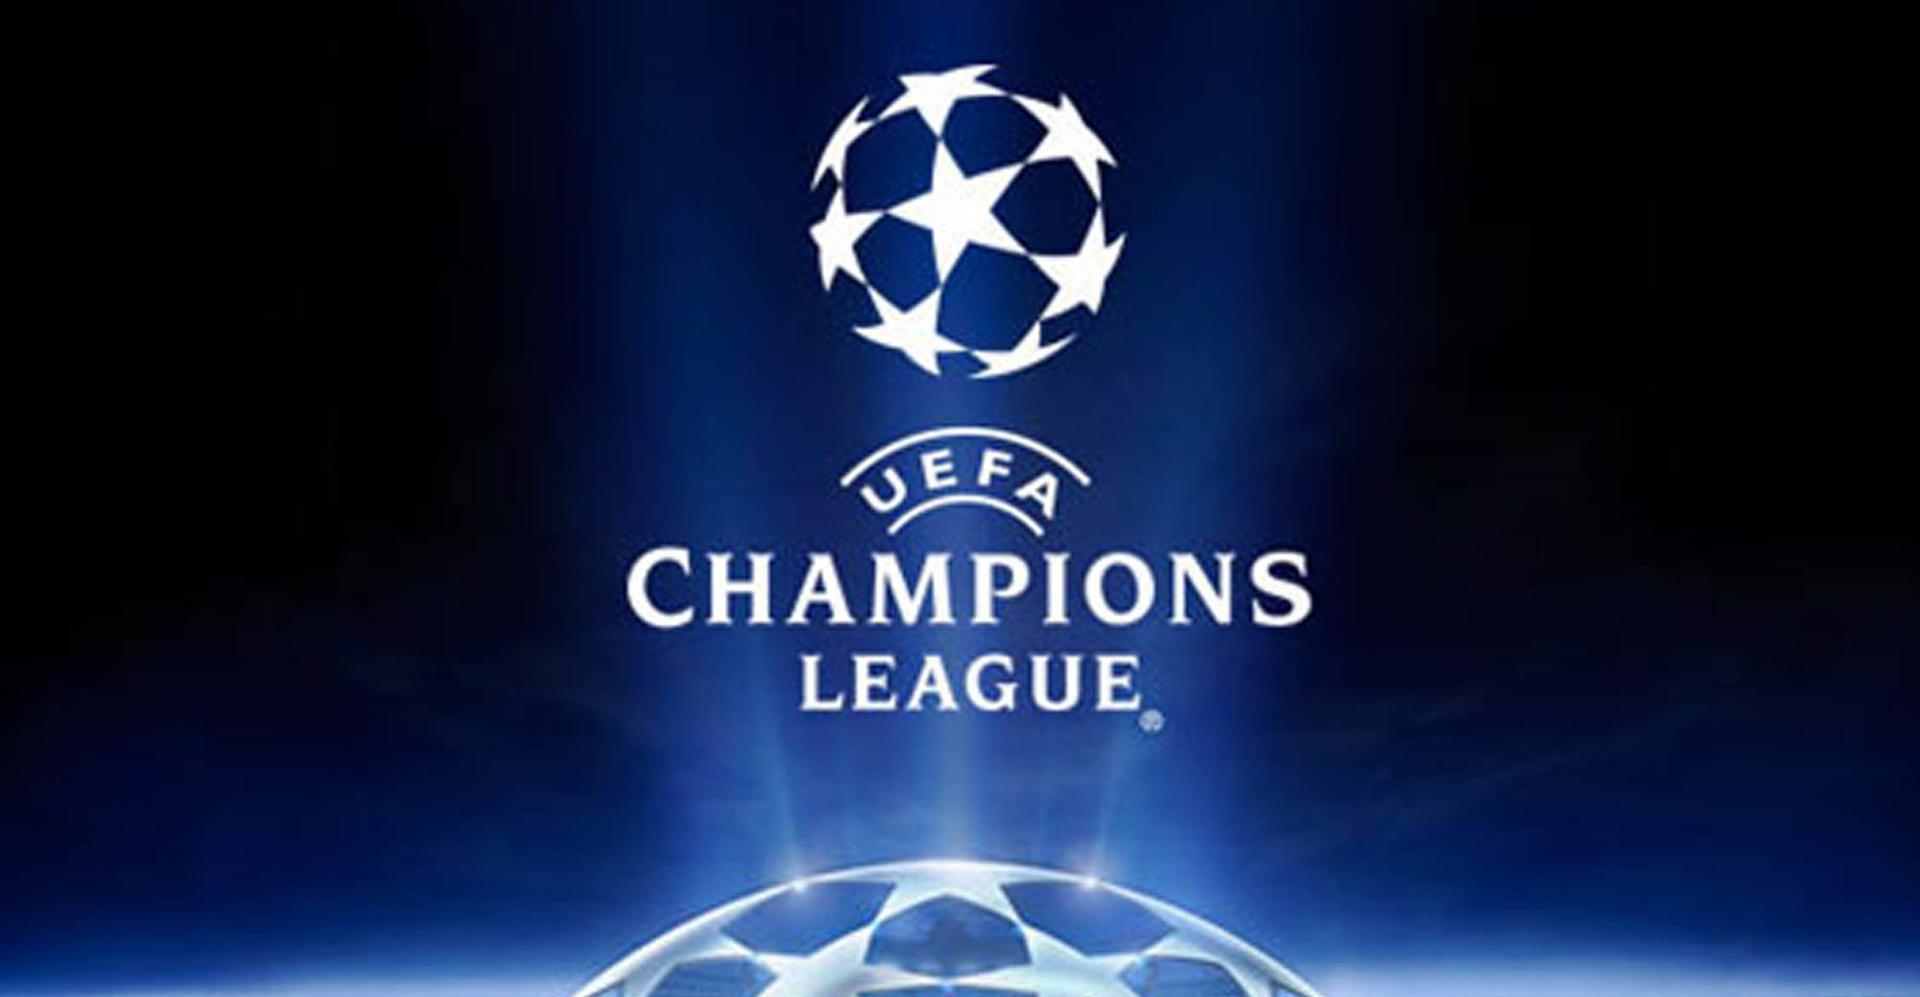 Officiel : Manchester City-Real Madrid reporté (coronavirus)